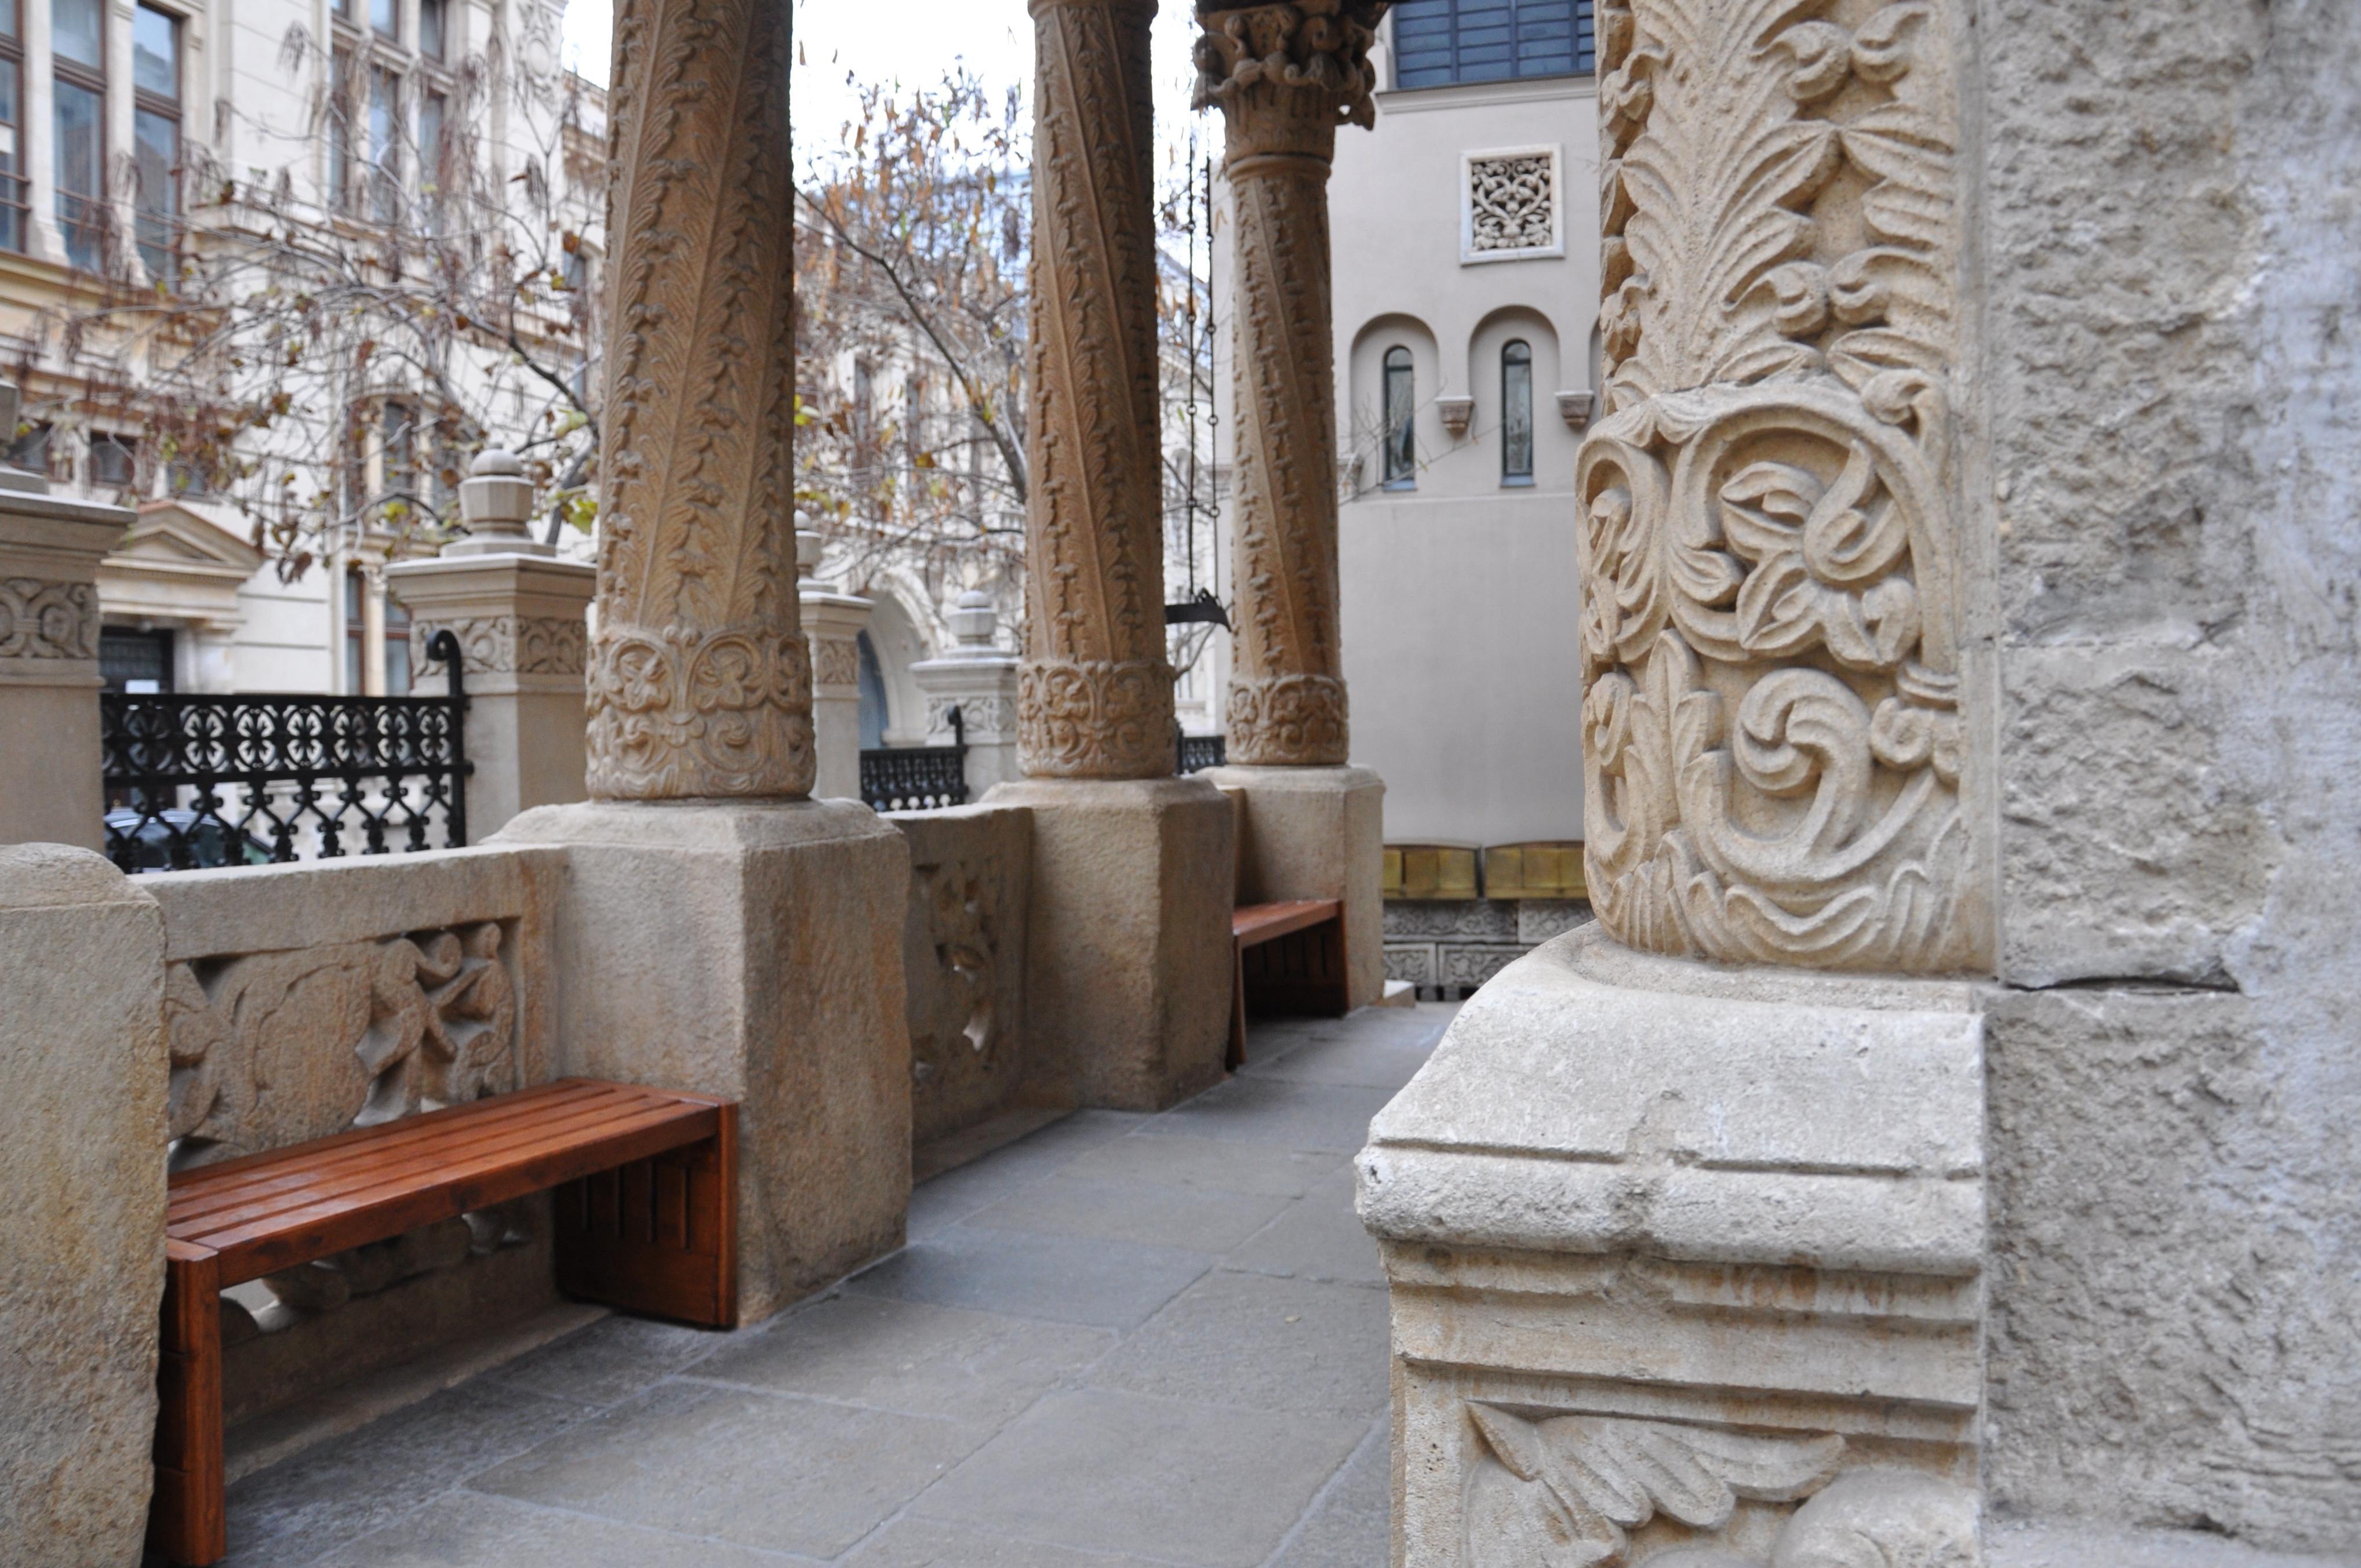 Free Picture Architecture Stone Ancient Sculpture Art